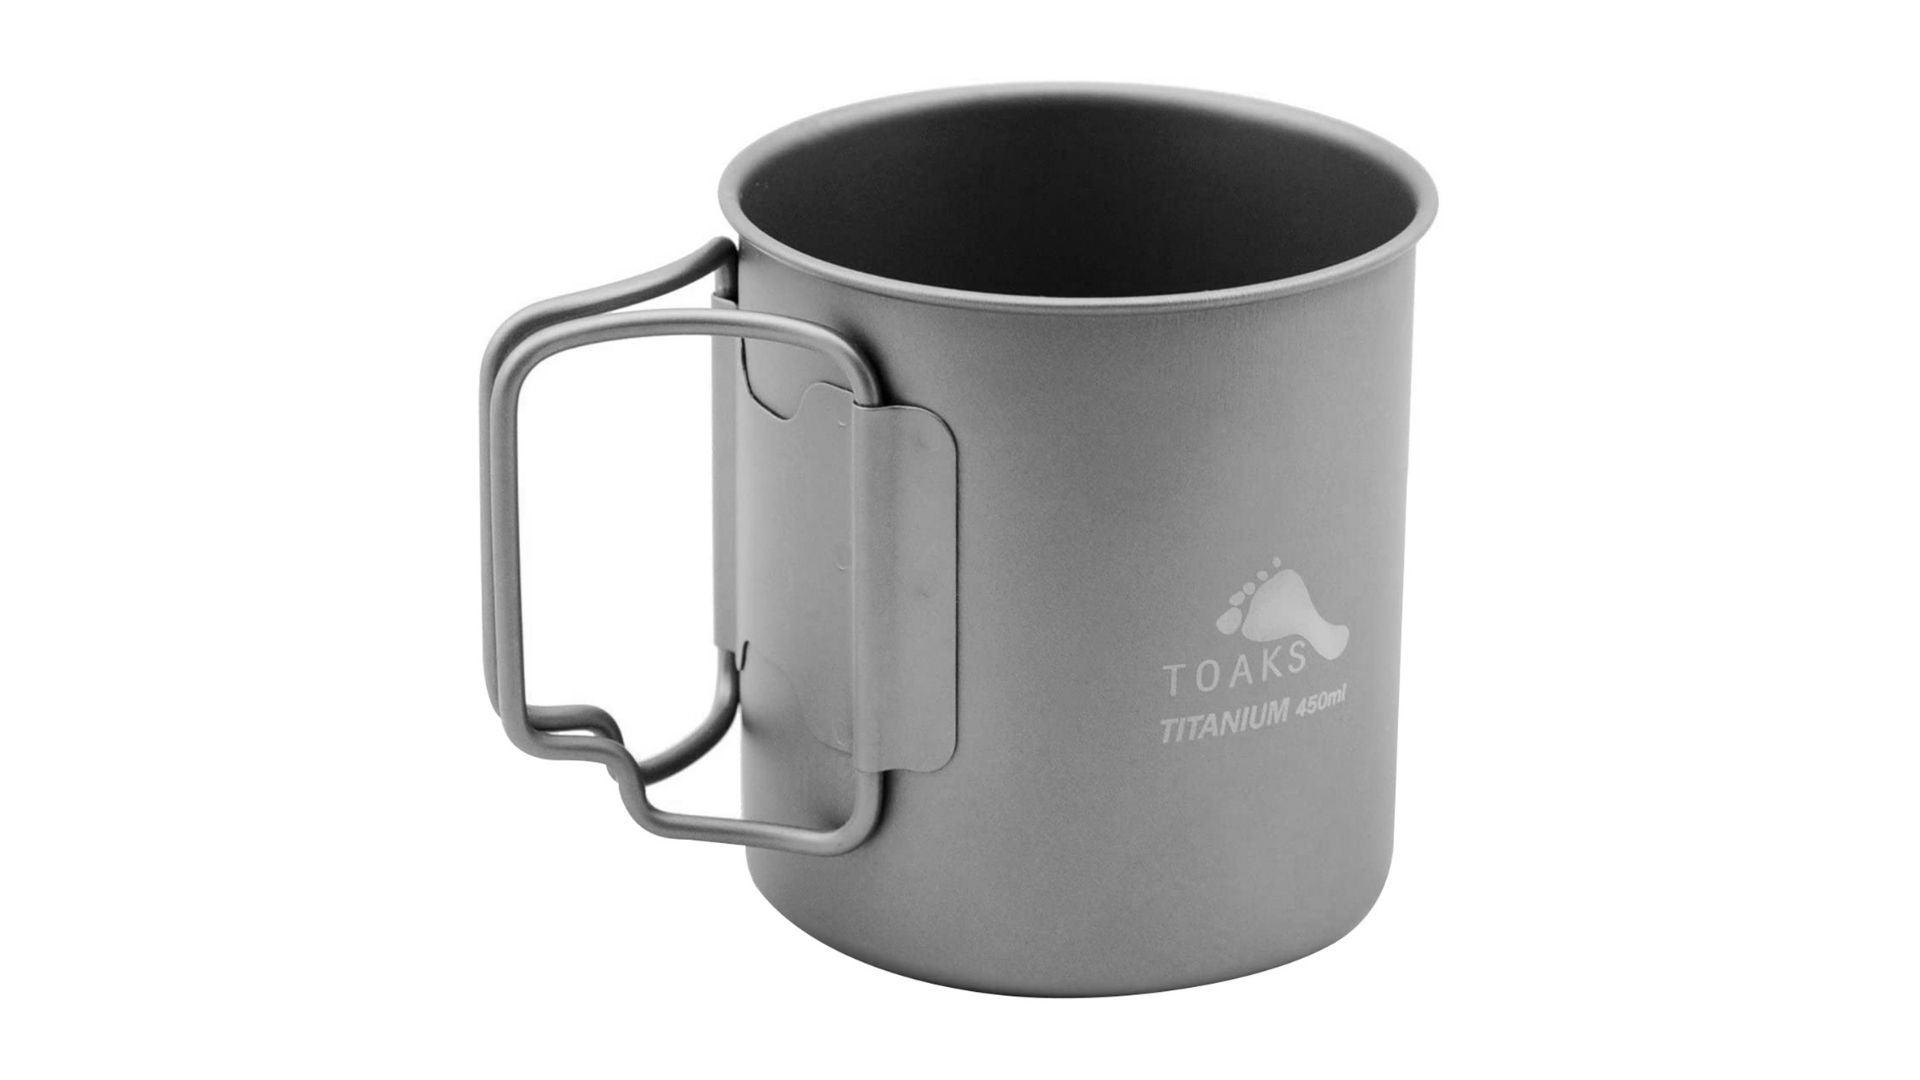 TOAKS Ultralight Portable Titanium Camping Mug 450 ml